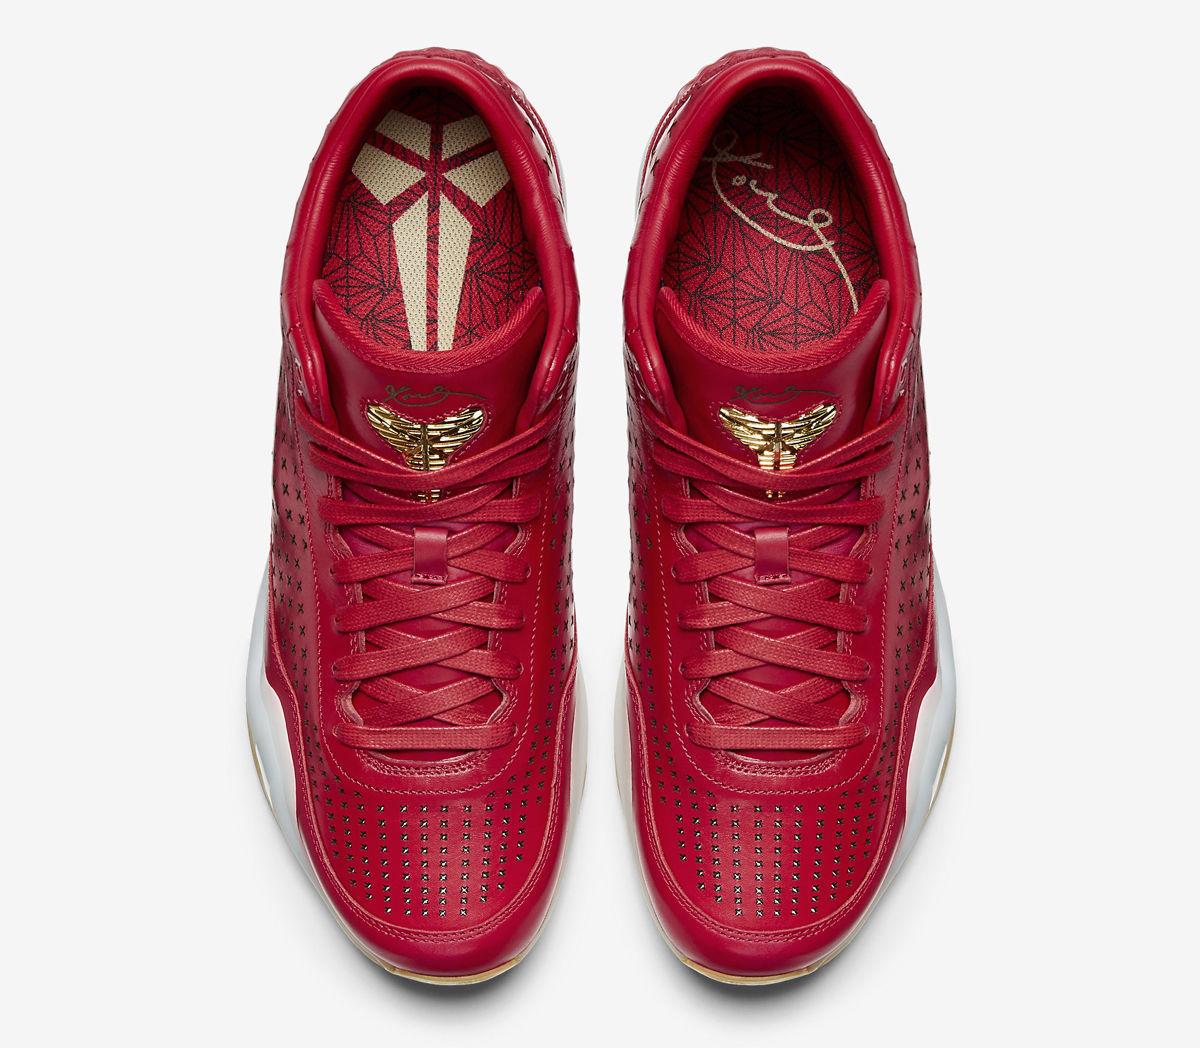 on sale 8de2c 55bf9 ... Mens SZ 8 Nike Kobe X 10 Mid EXT RED Metallic Gold Gum Bottom 802366 600  ...